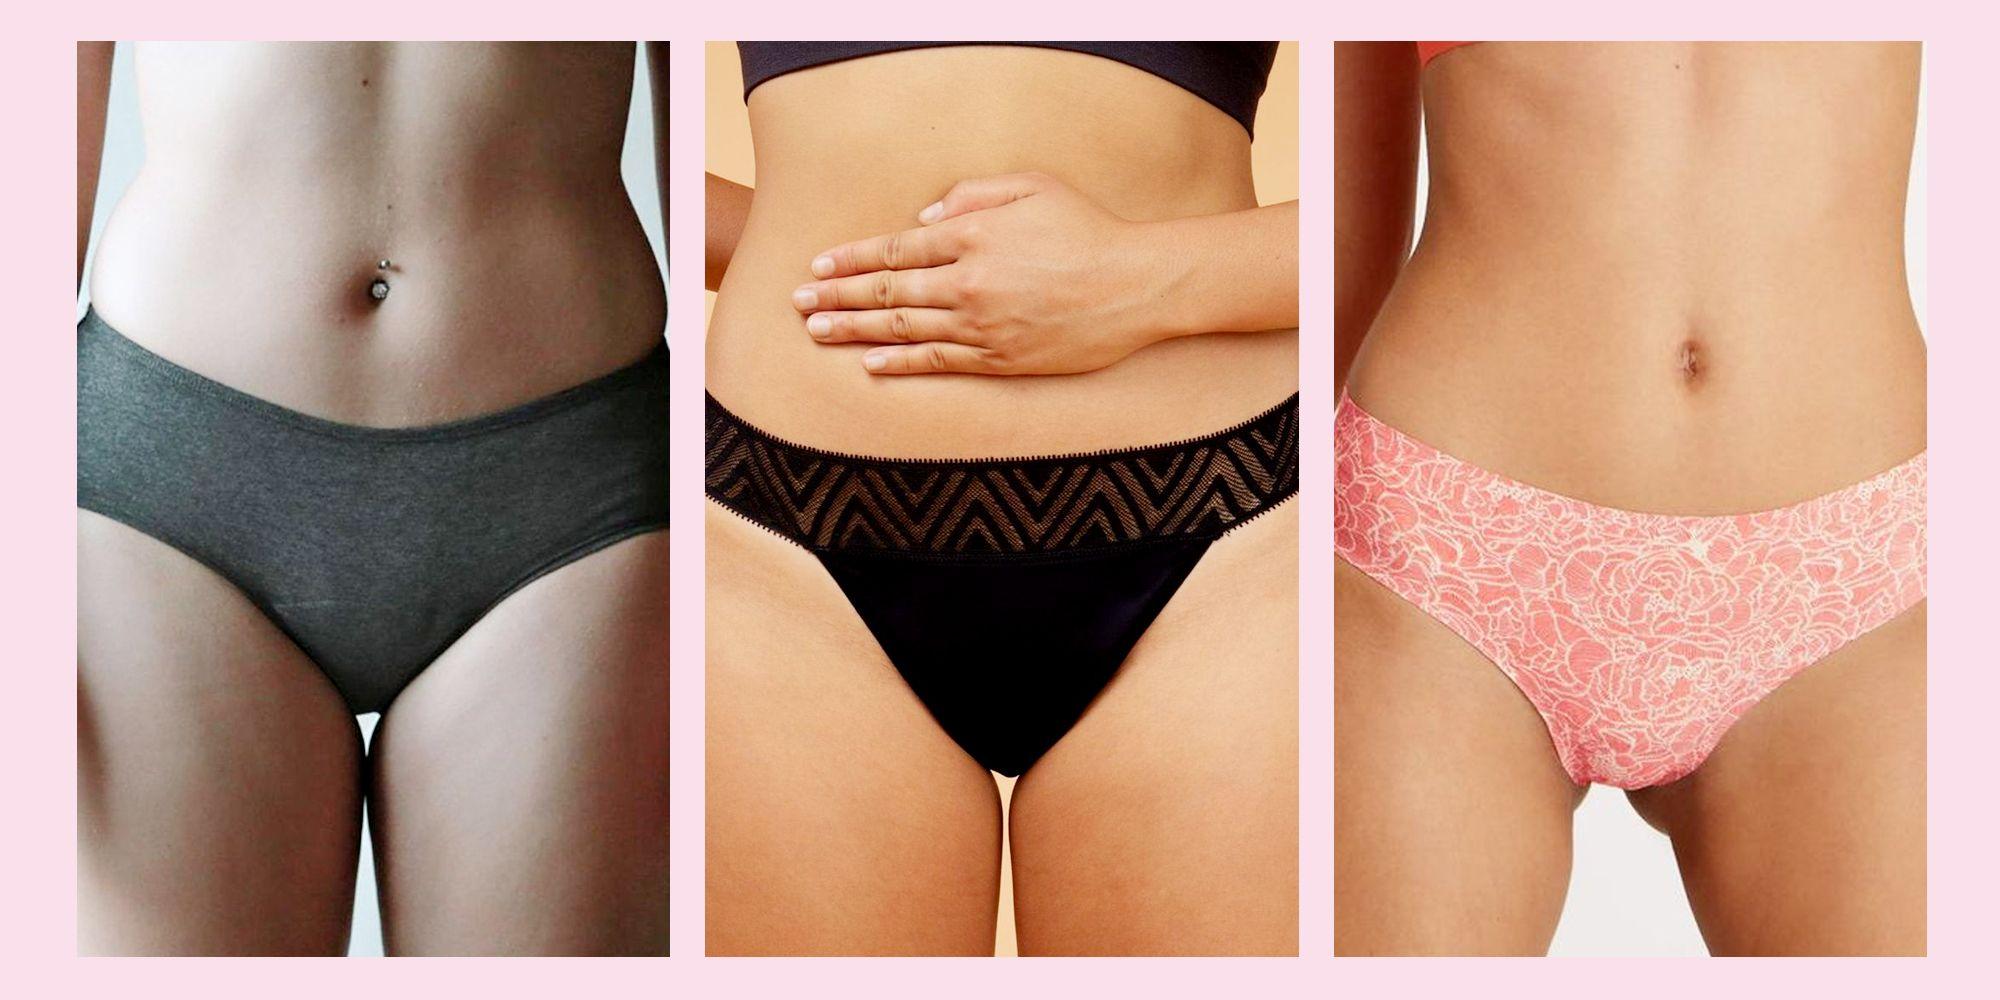 period panties tumblr